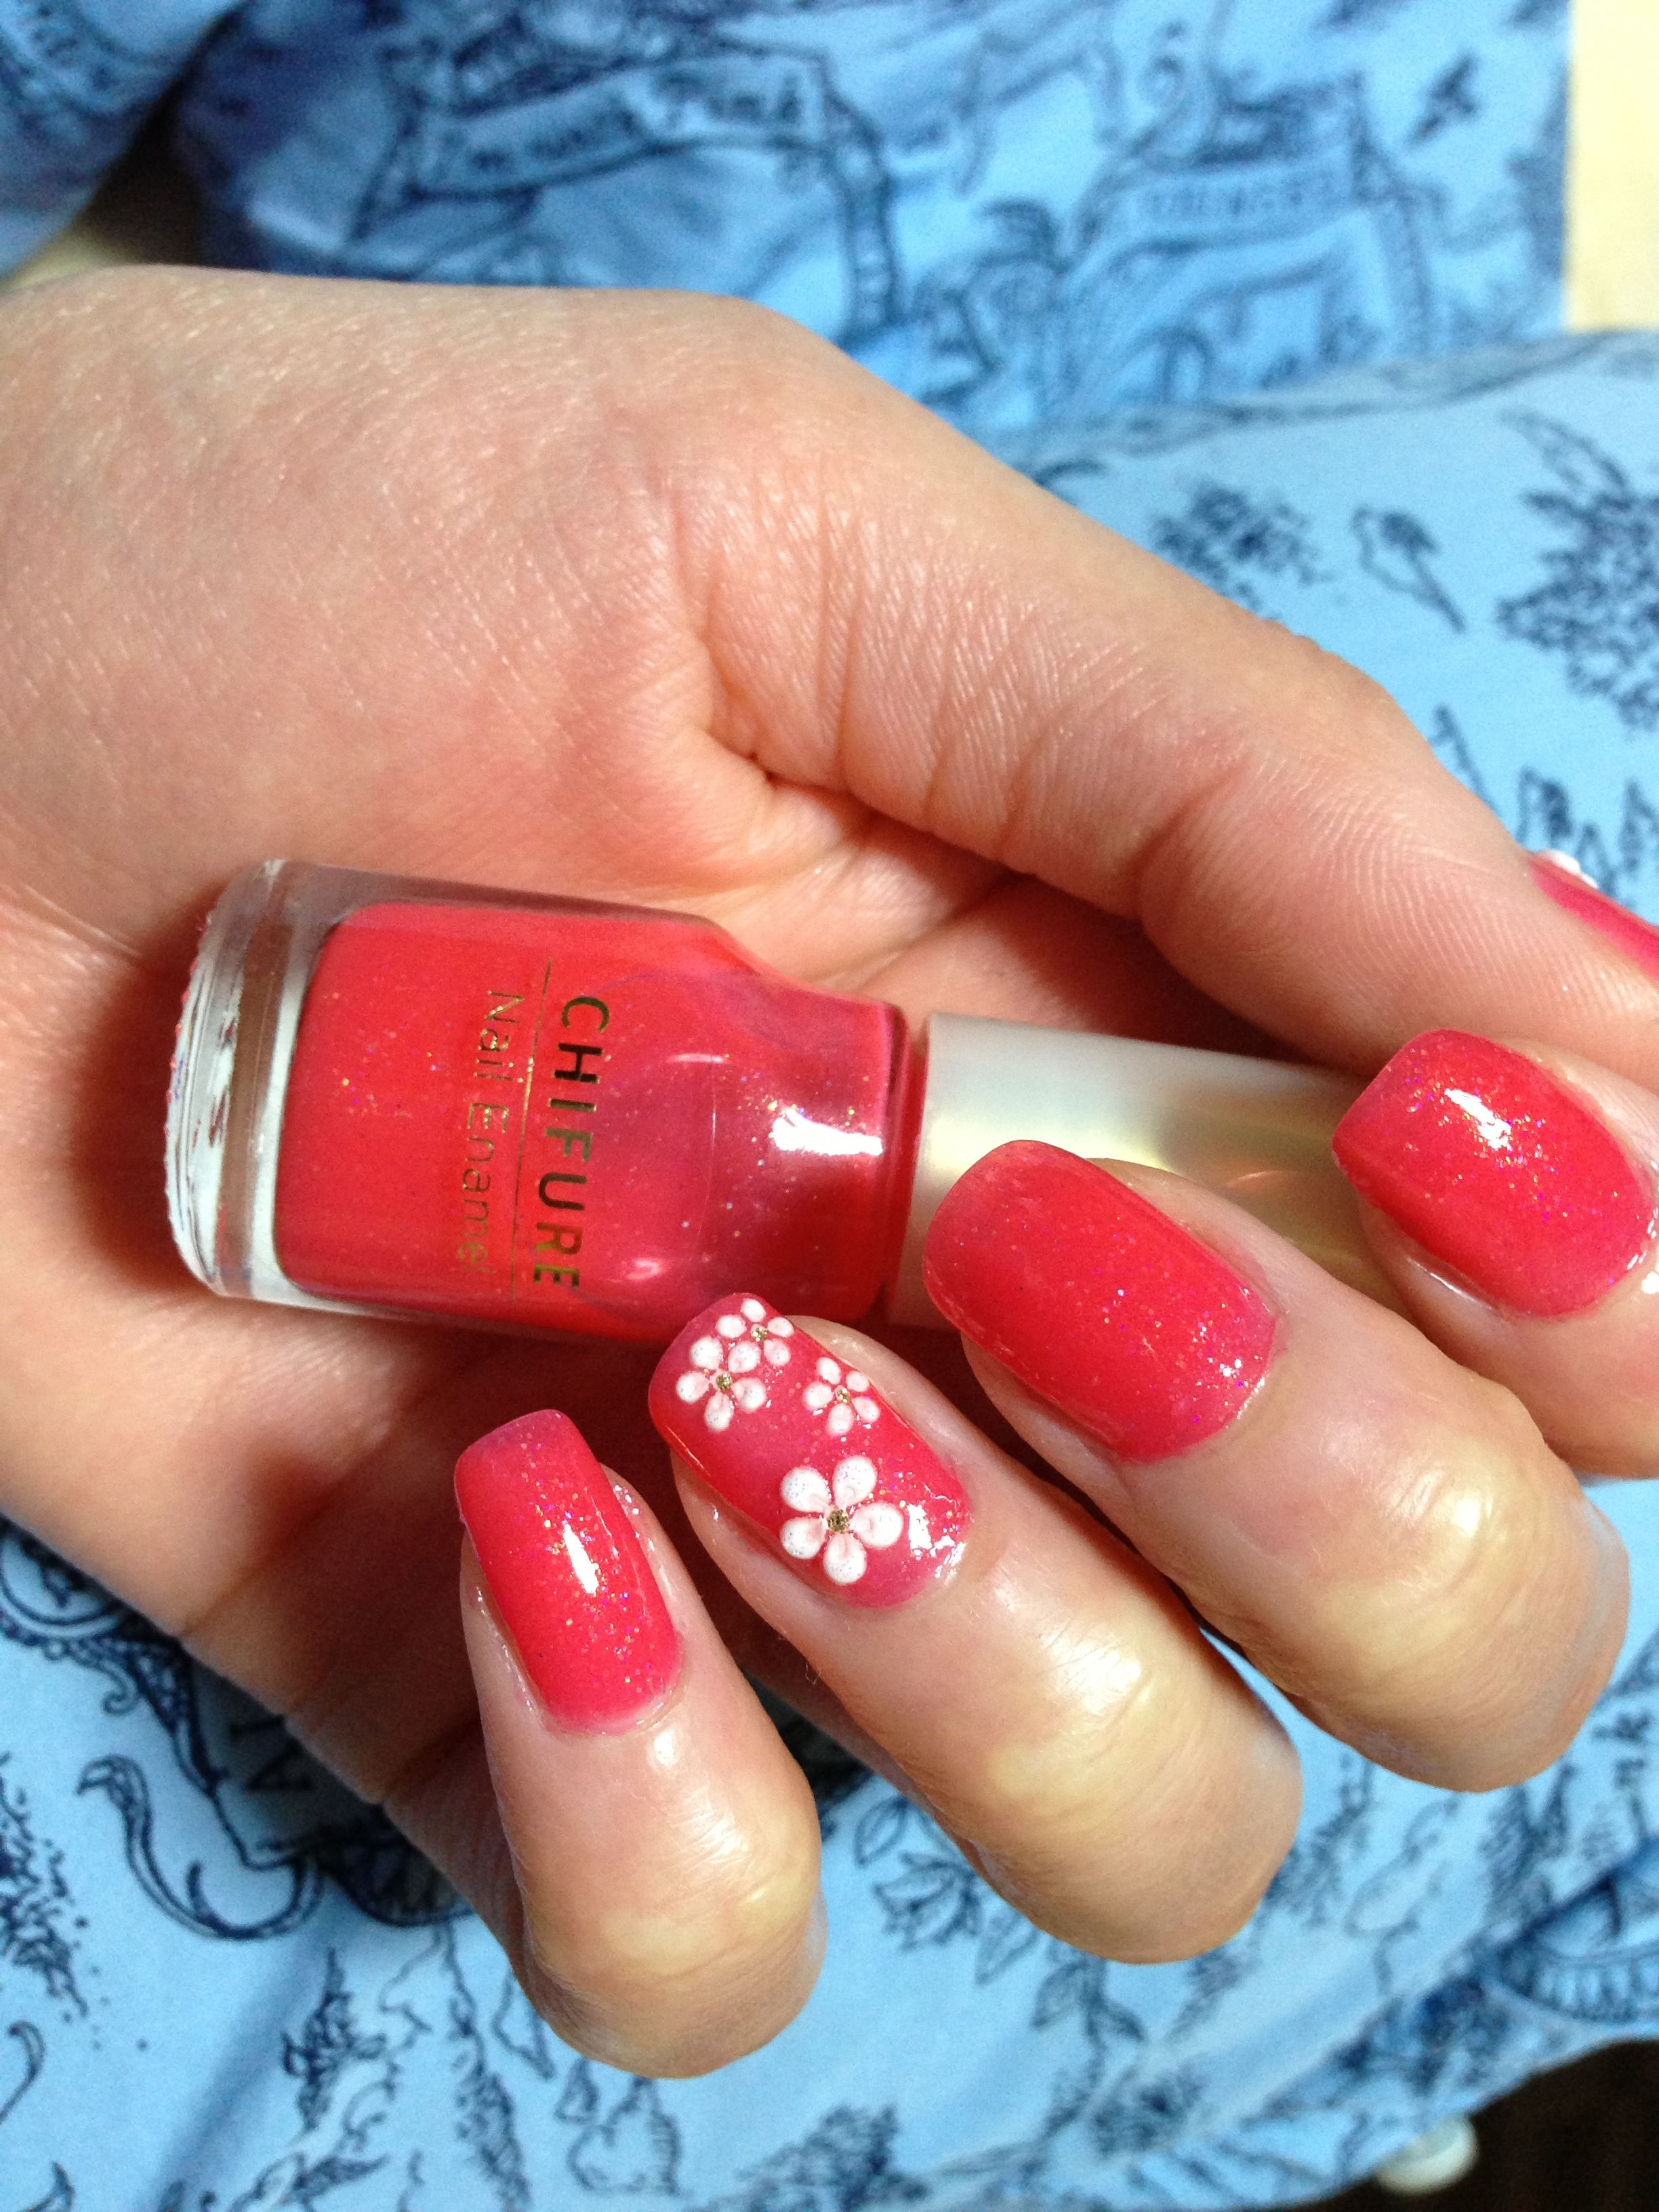 Chifure - Japanese | Polish Brands I need! | Pinterest